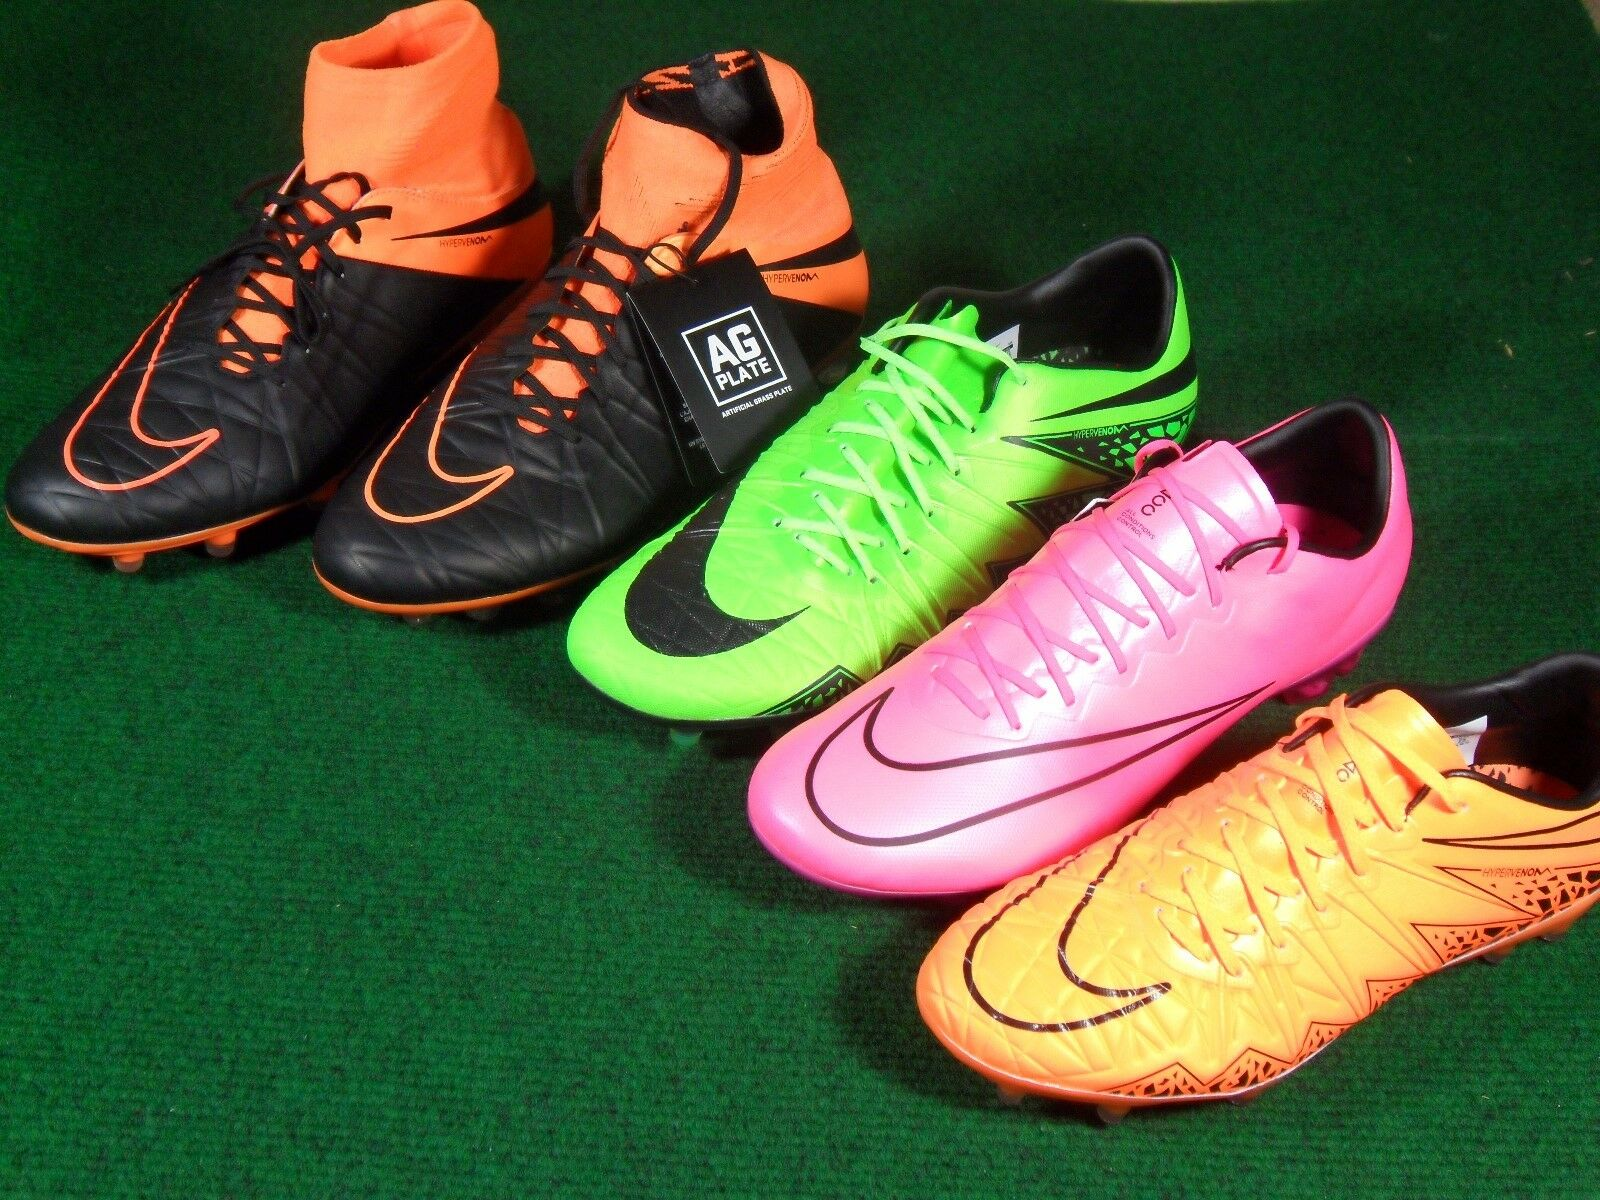 Nike Hypervenom Phinish Mercurial Vapor X XI Phantom Phatal FG AG Soccer Cleats